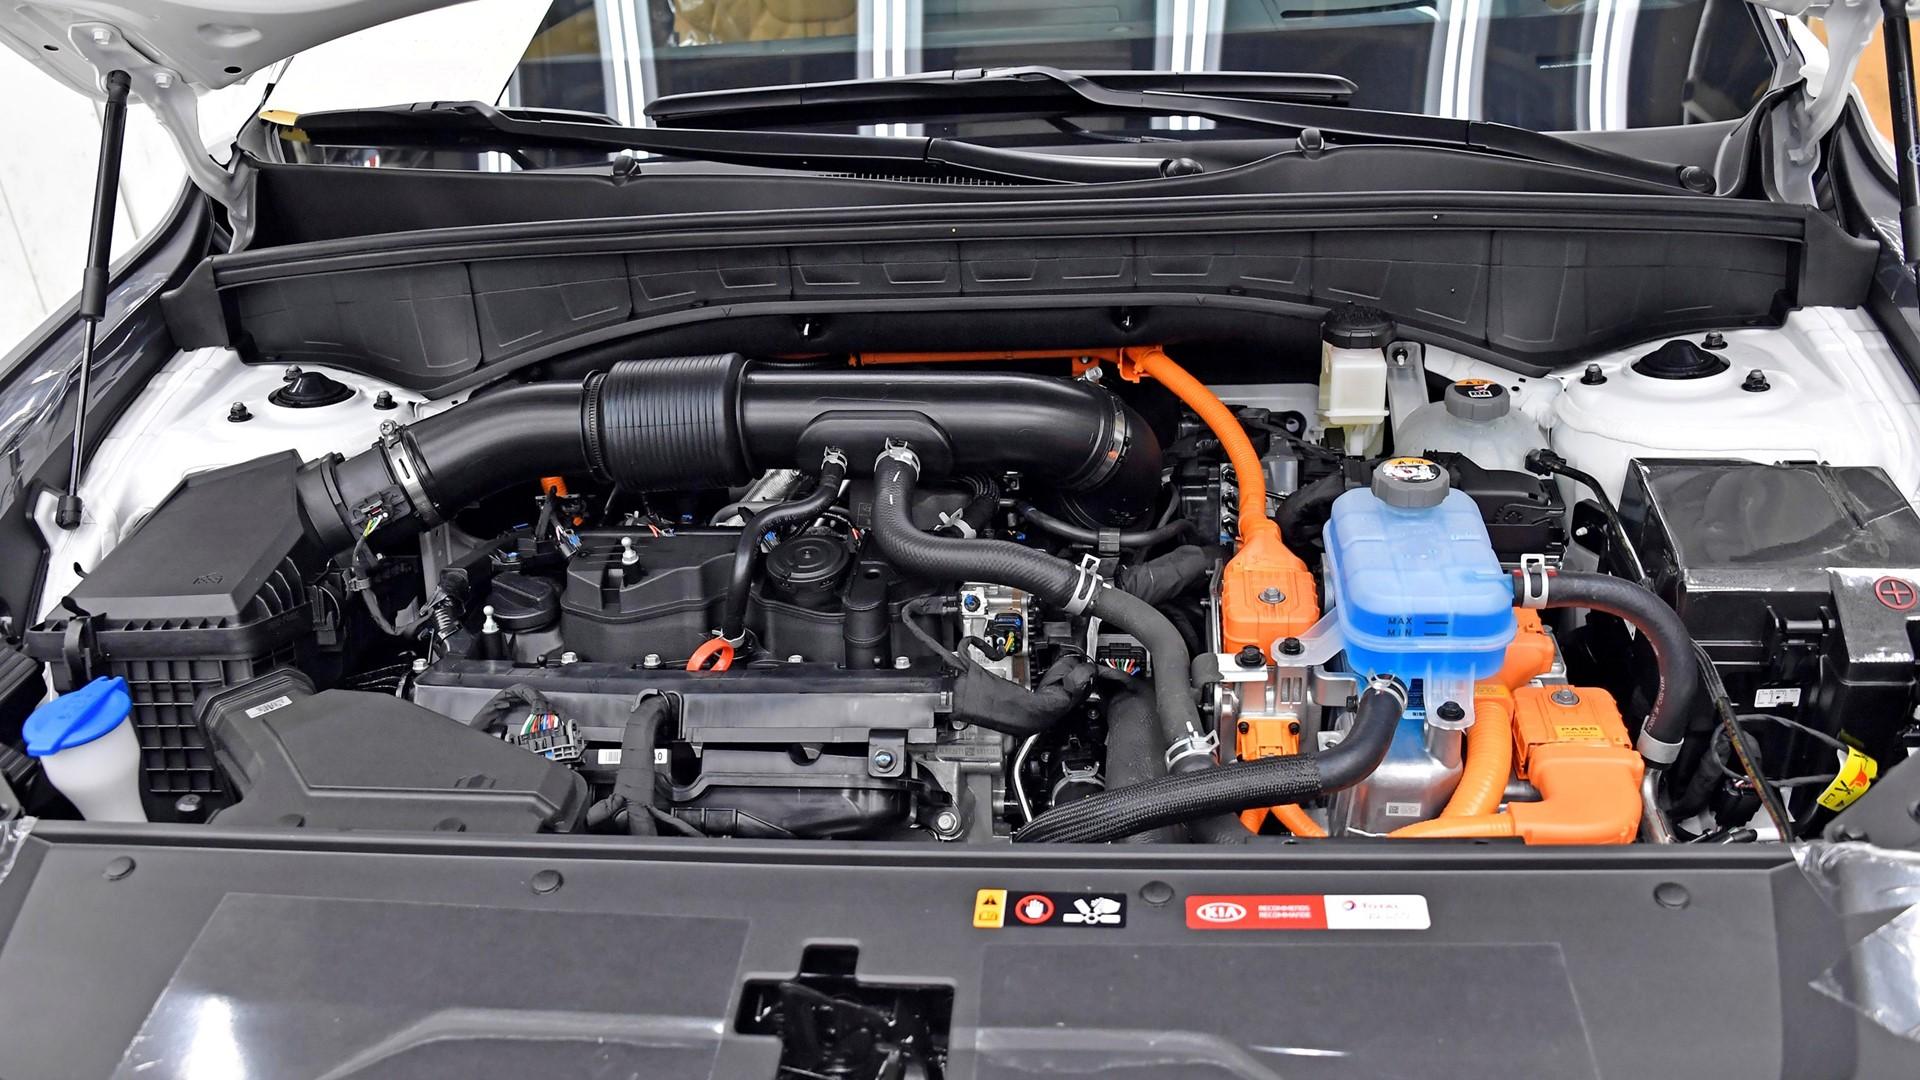 Start of production for new Kia Sorento Hybrid - Image 2